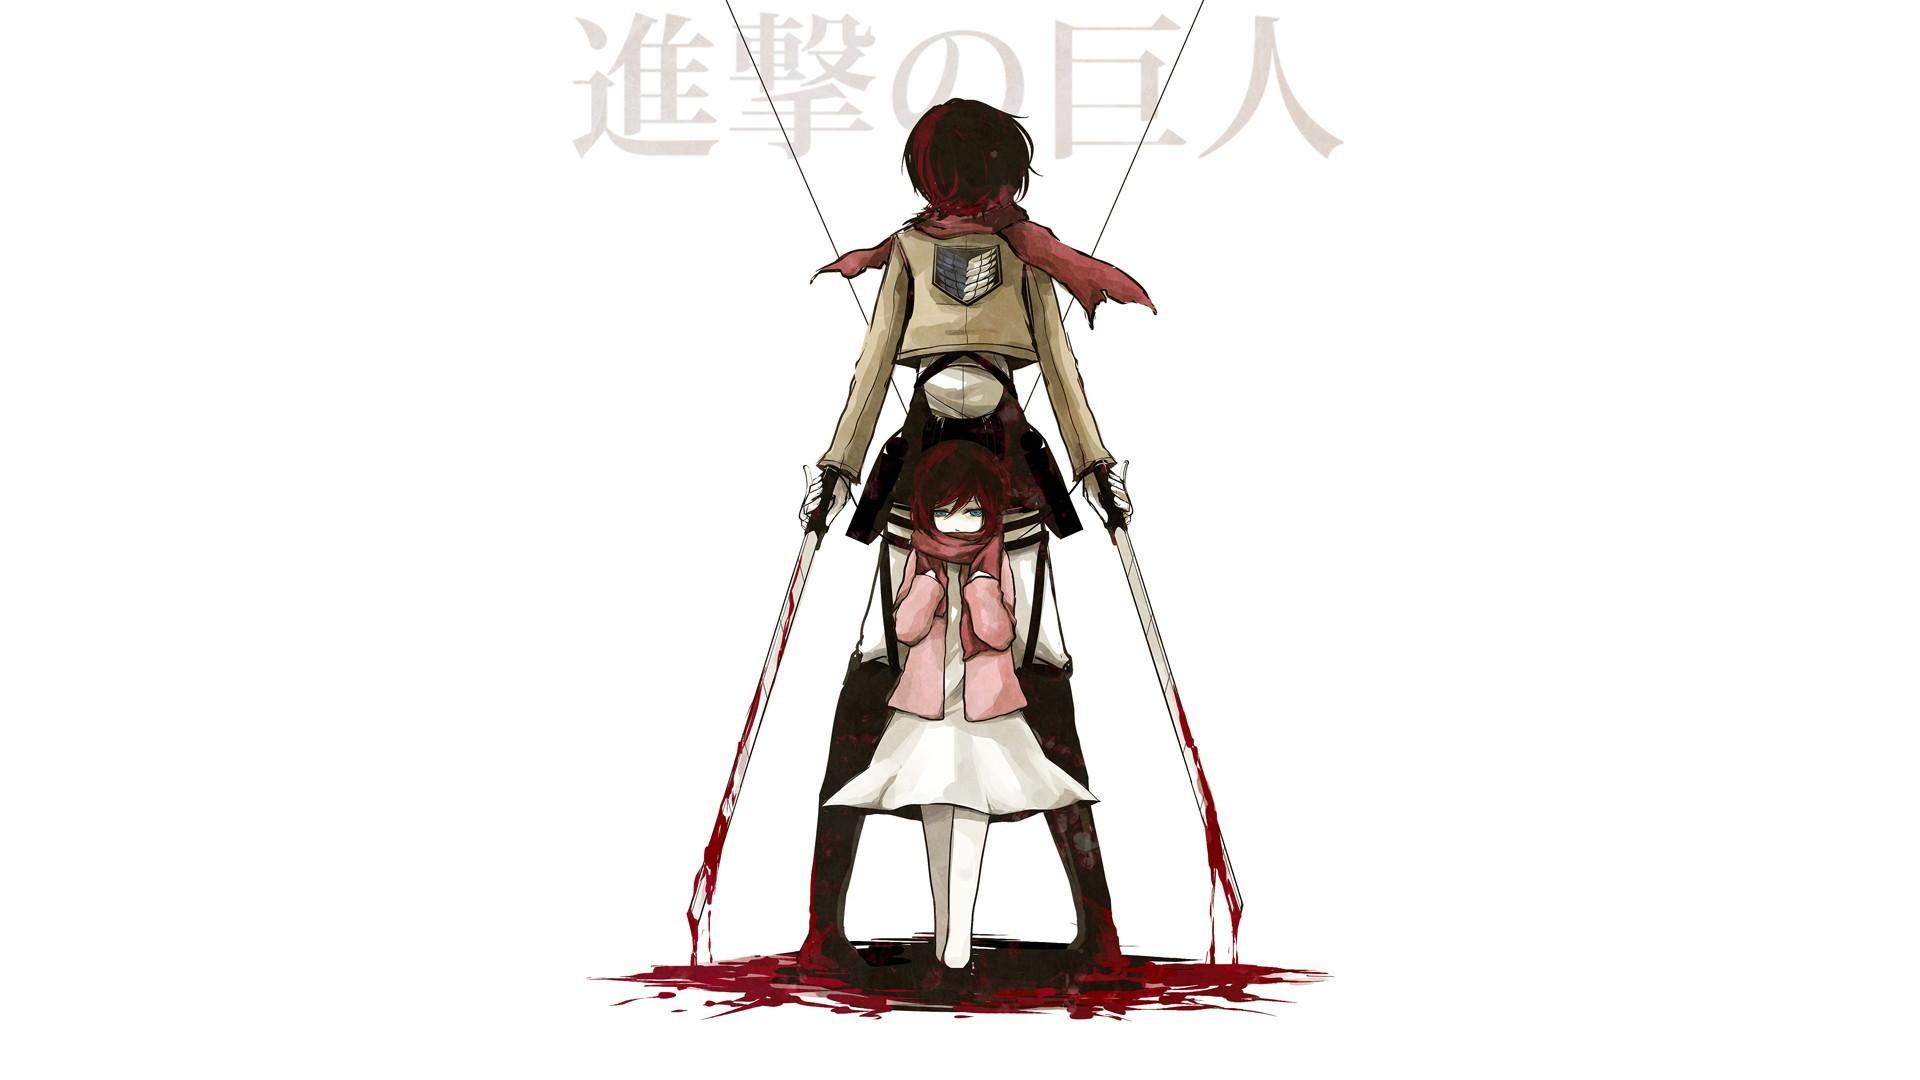 Japanese Anime Shingeki No Kyojin Desktop Wallpapers 1920x1080